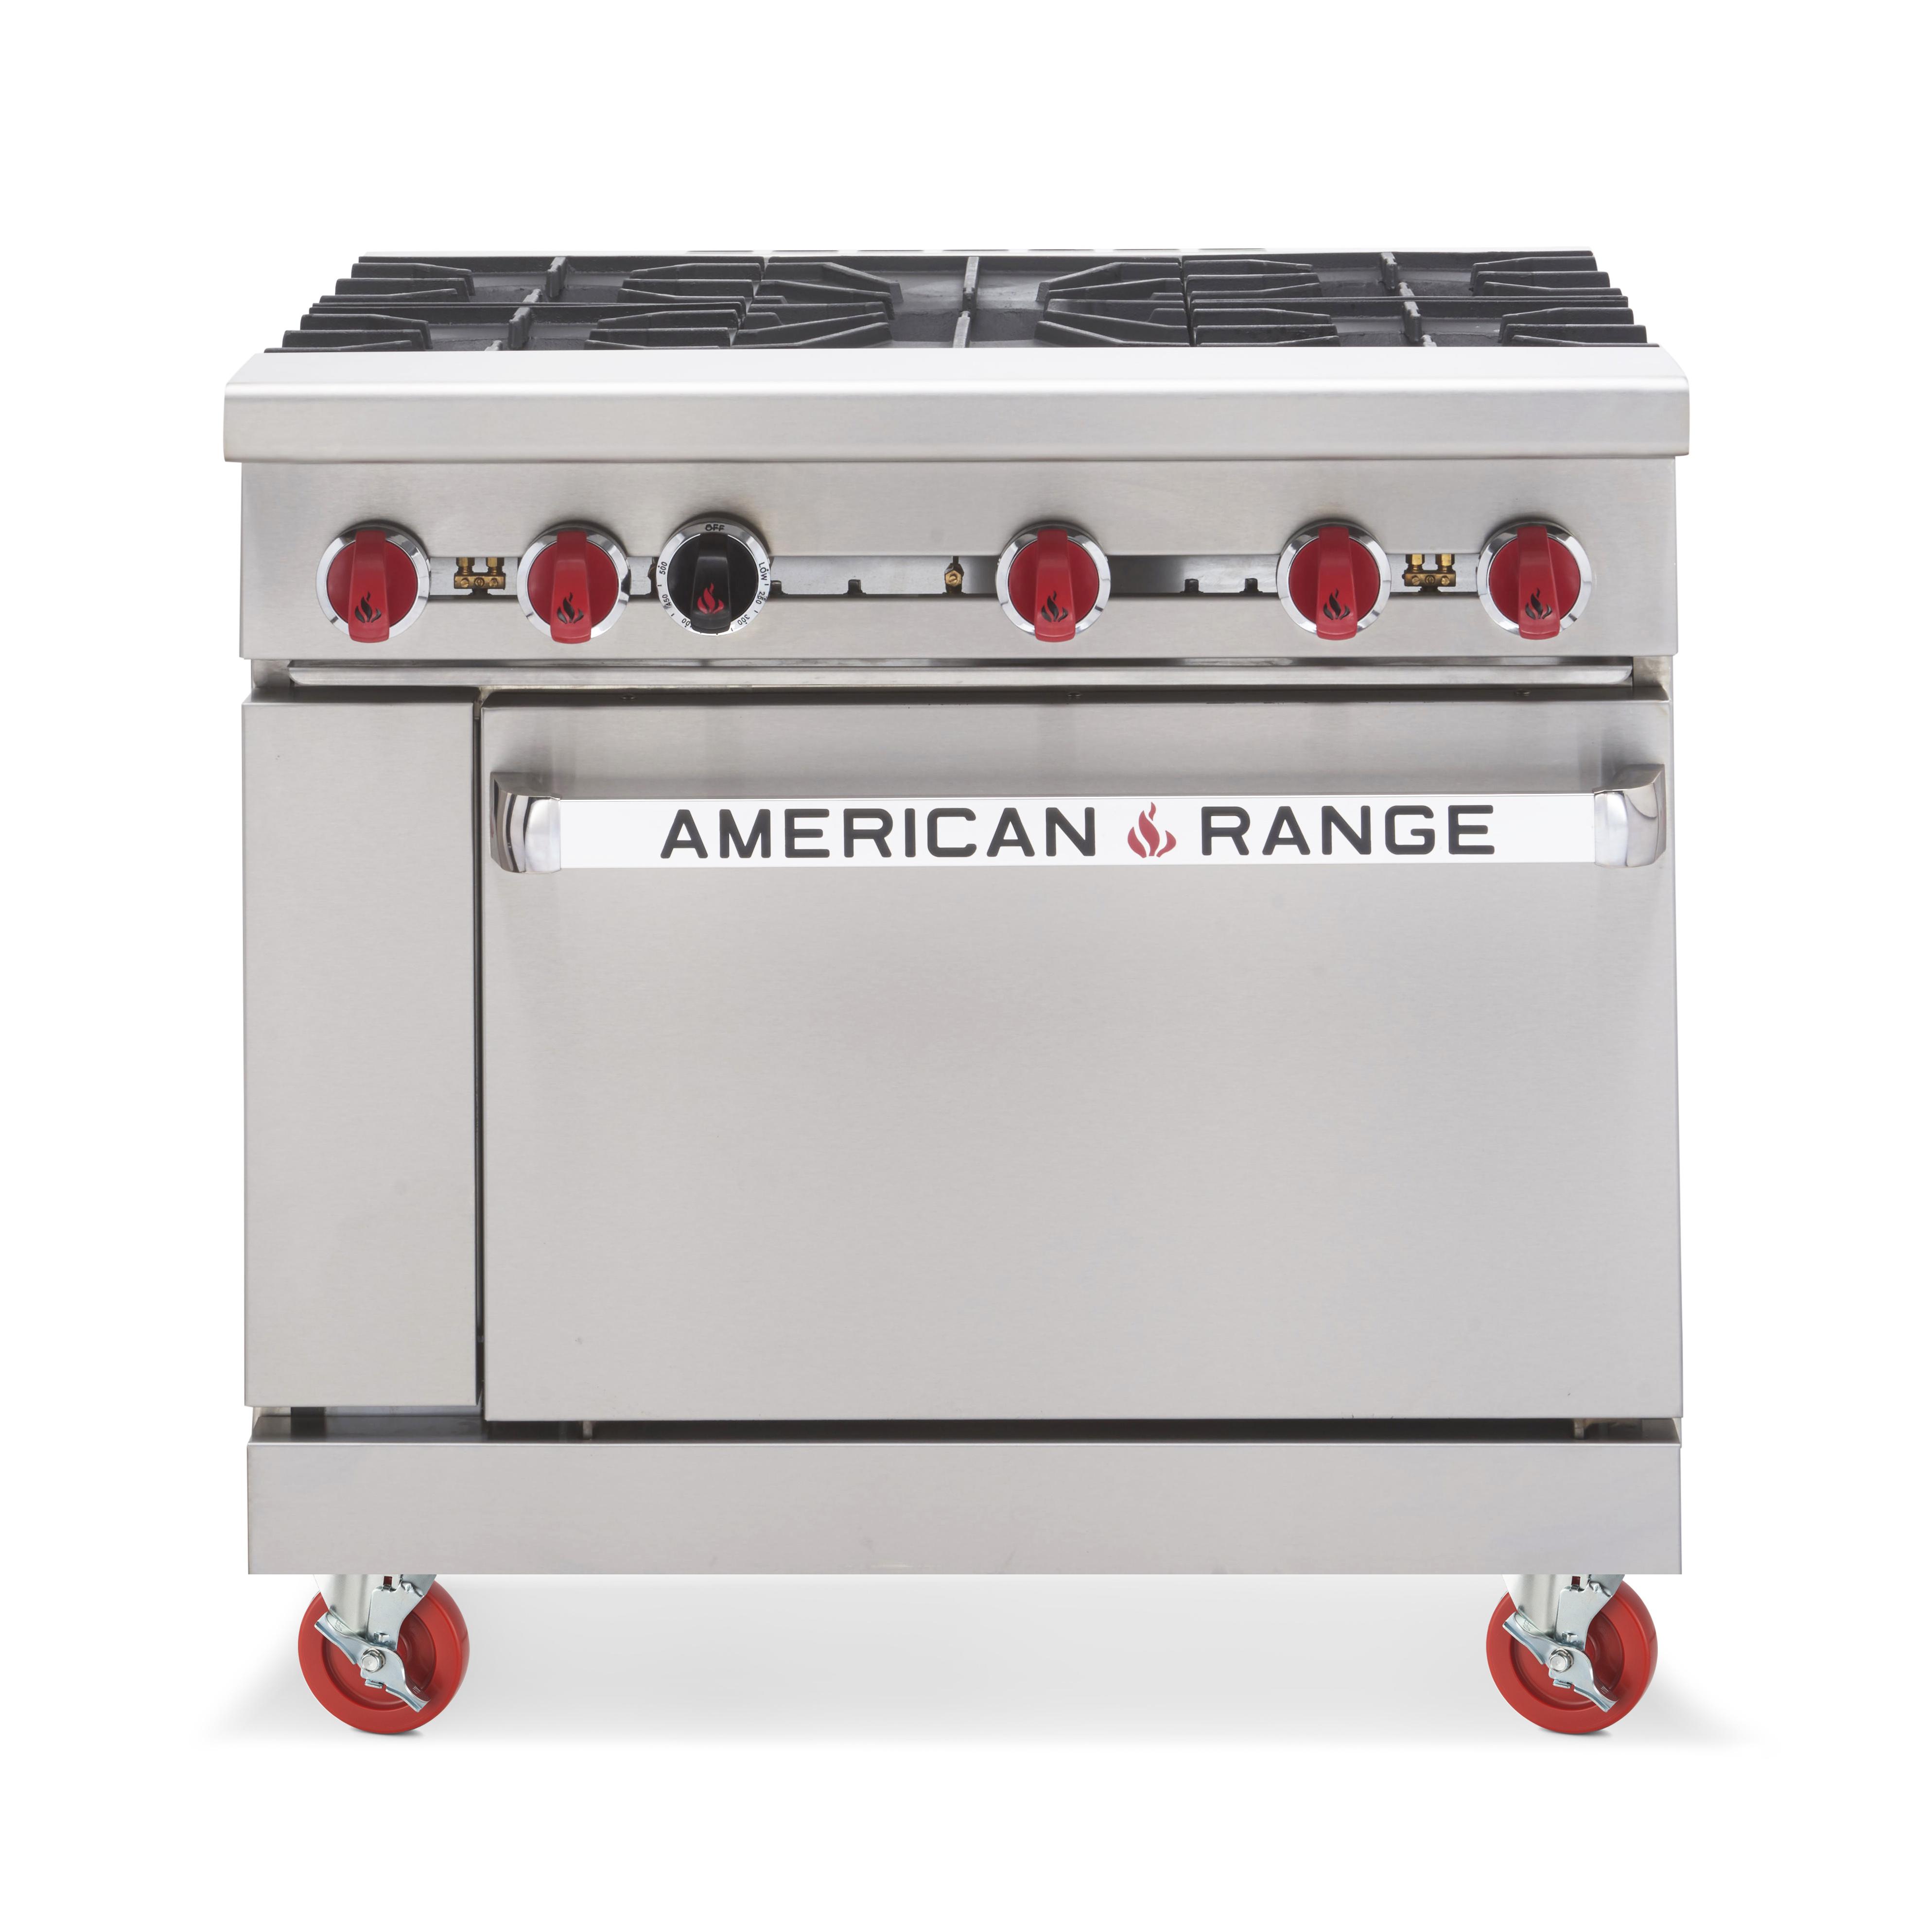 American Range AR-5 range, 36